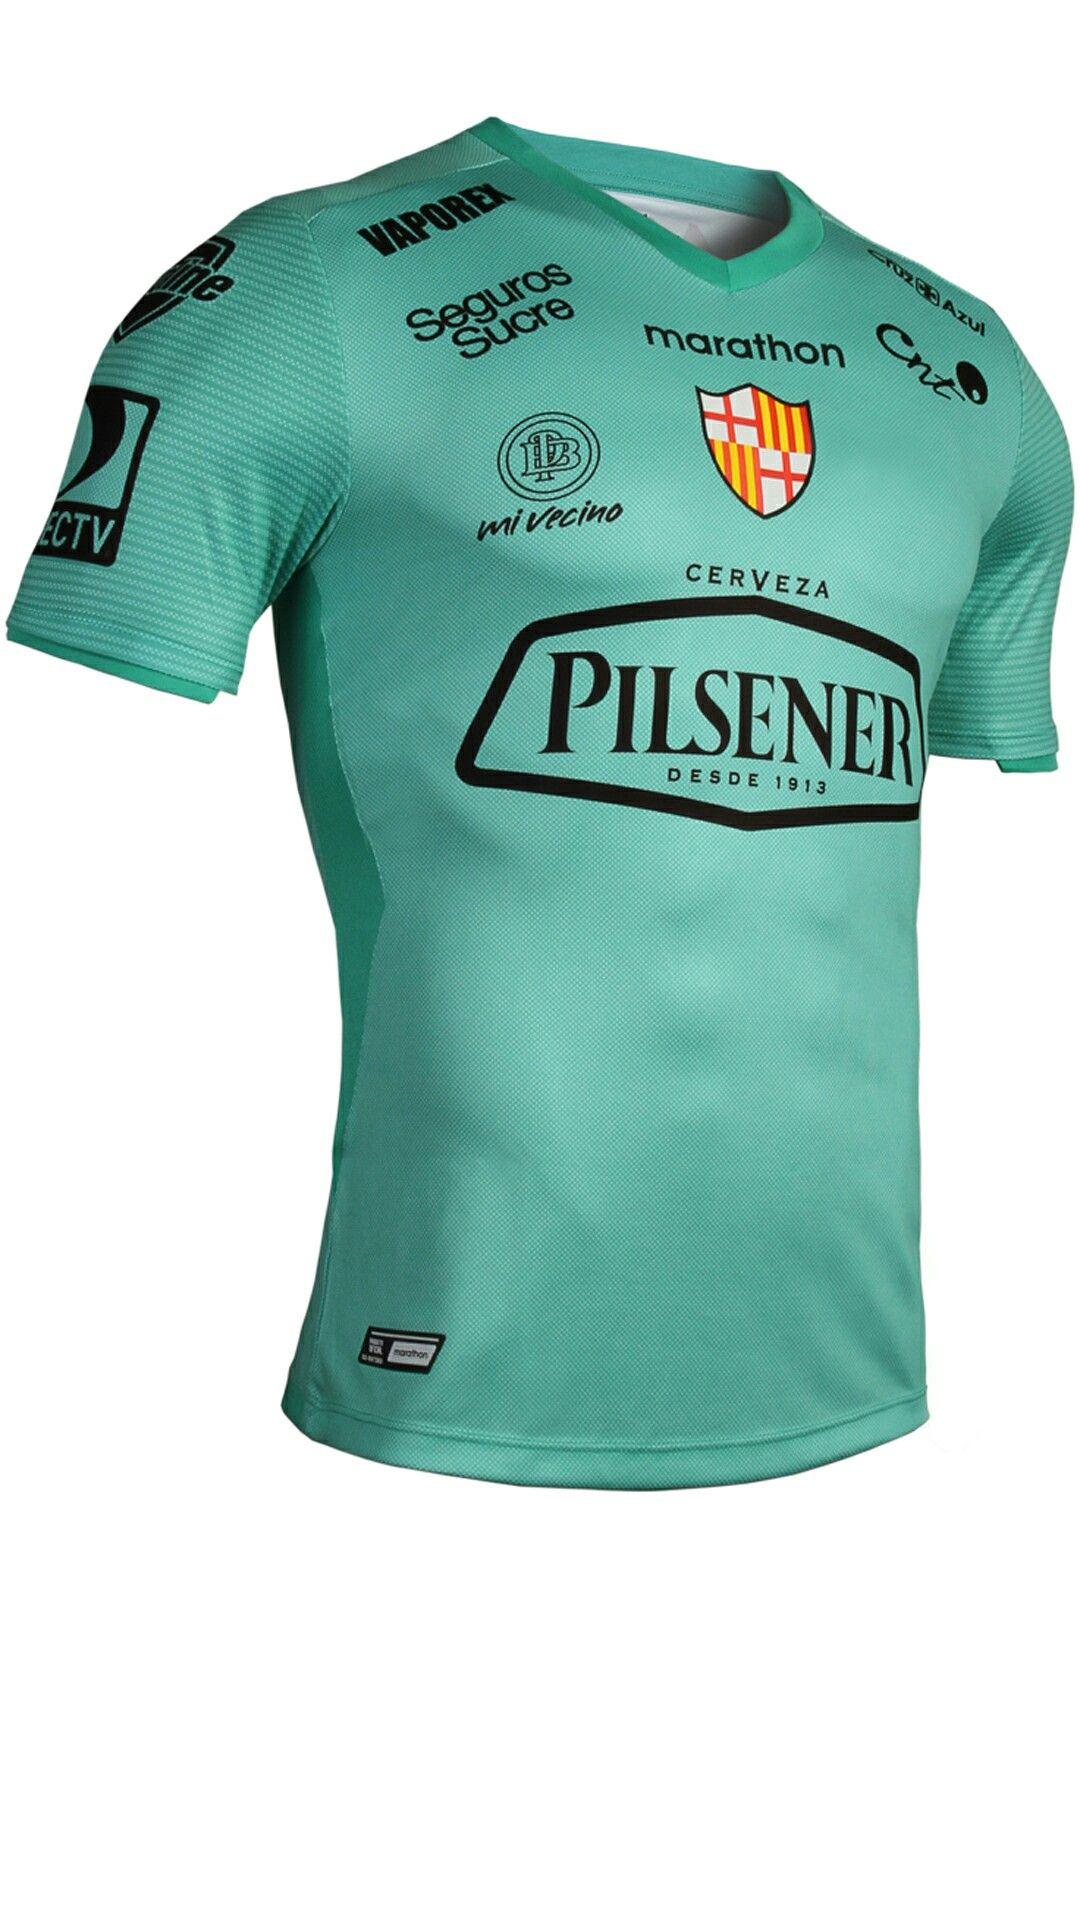 Camiseta Alterna de Barcelona Sporting Club 2018 x Marathon ... 33619753fbe